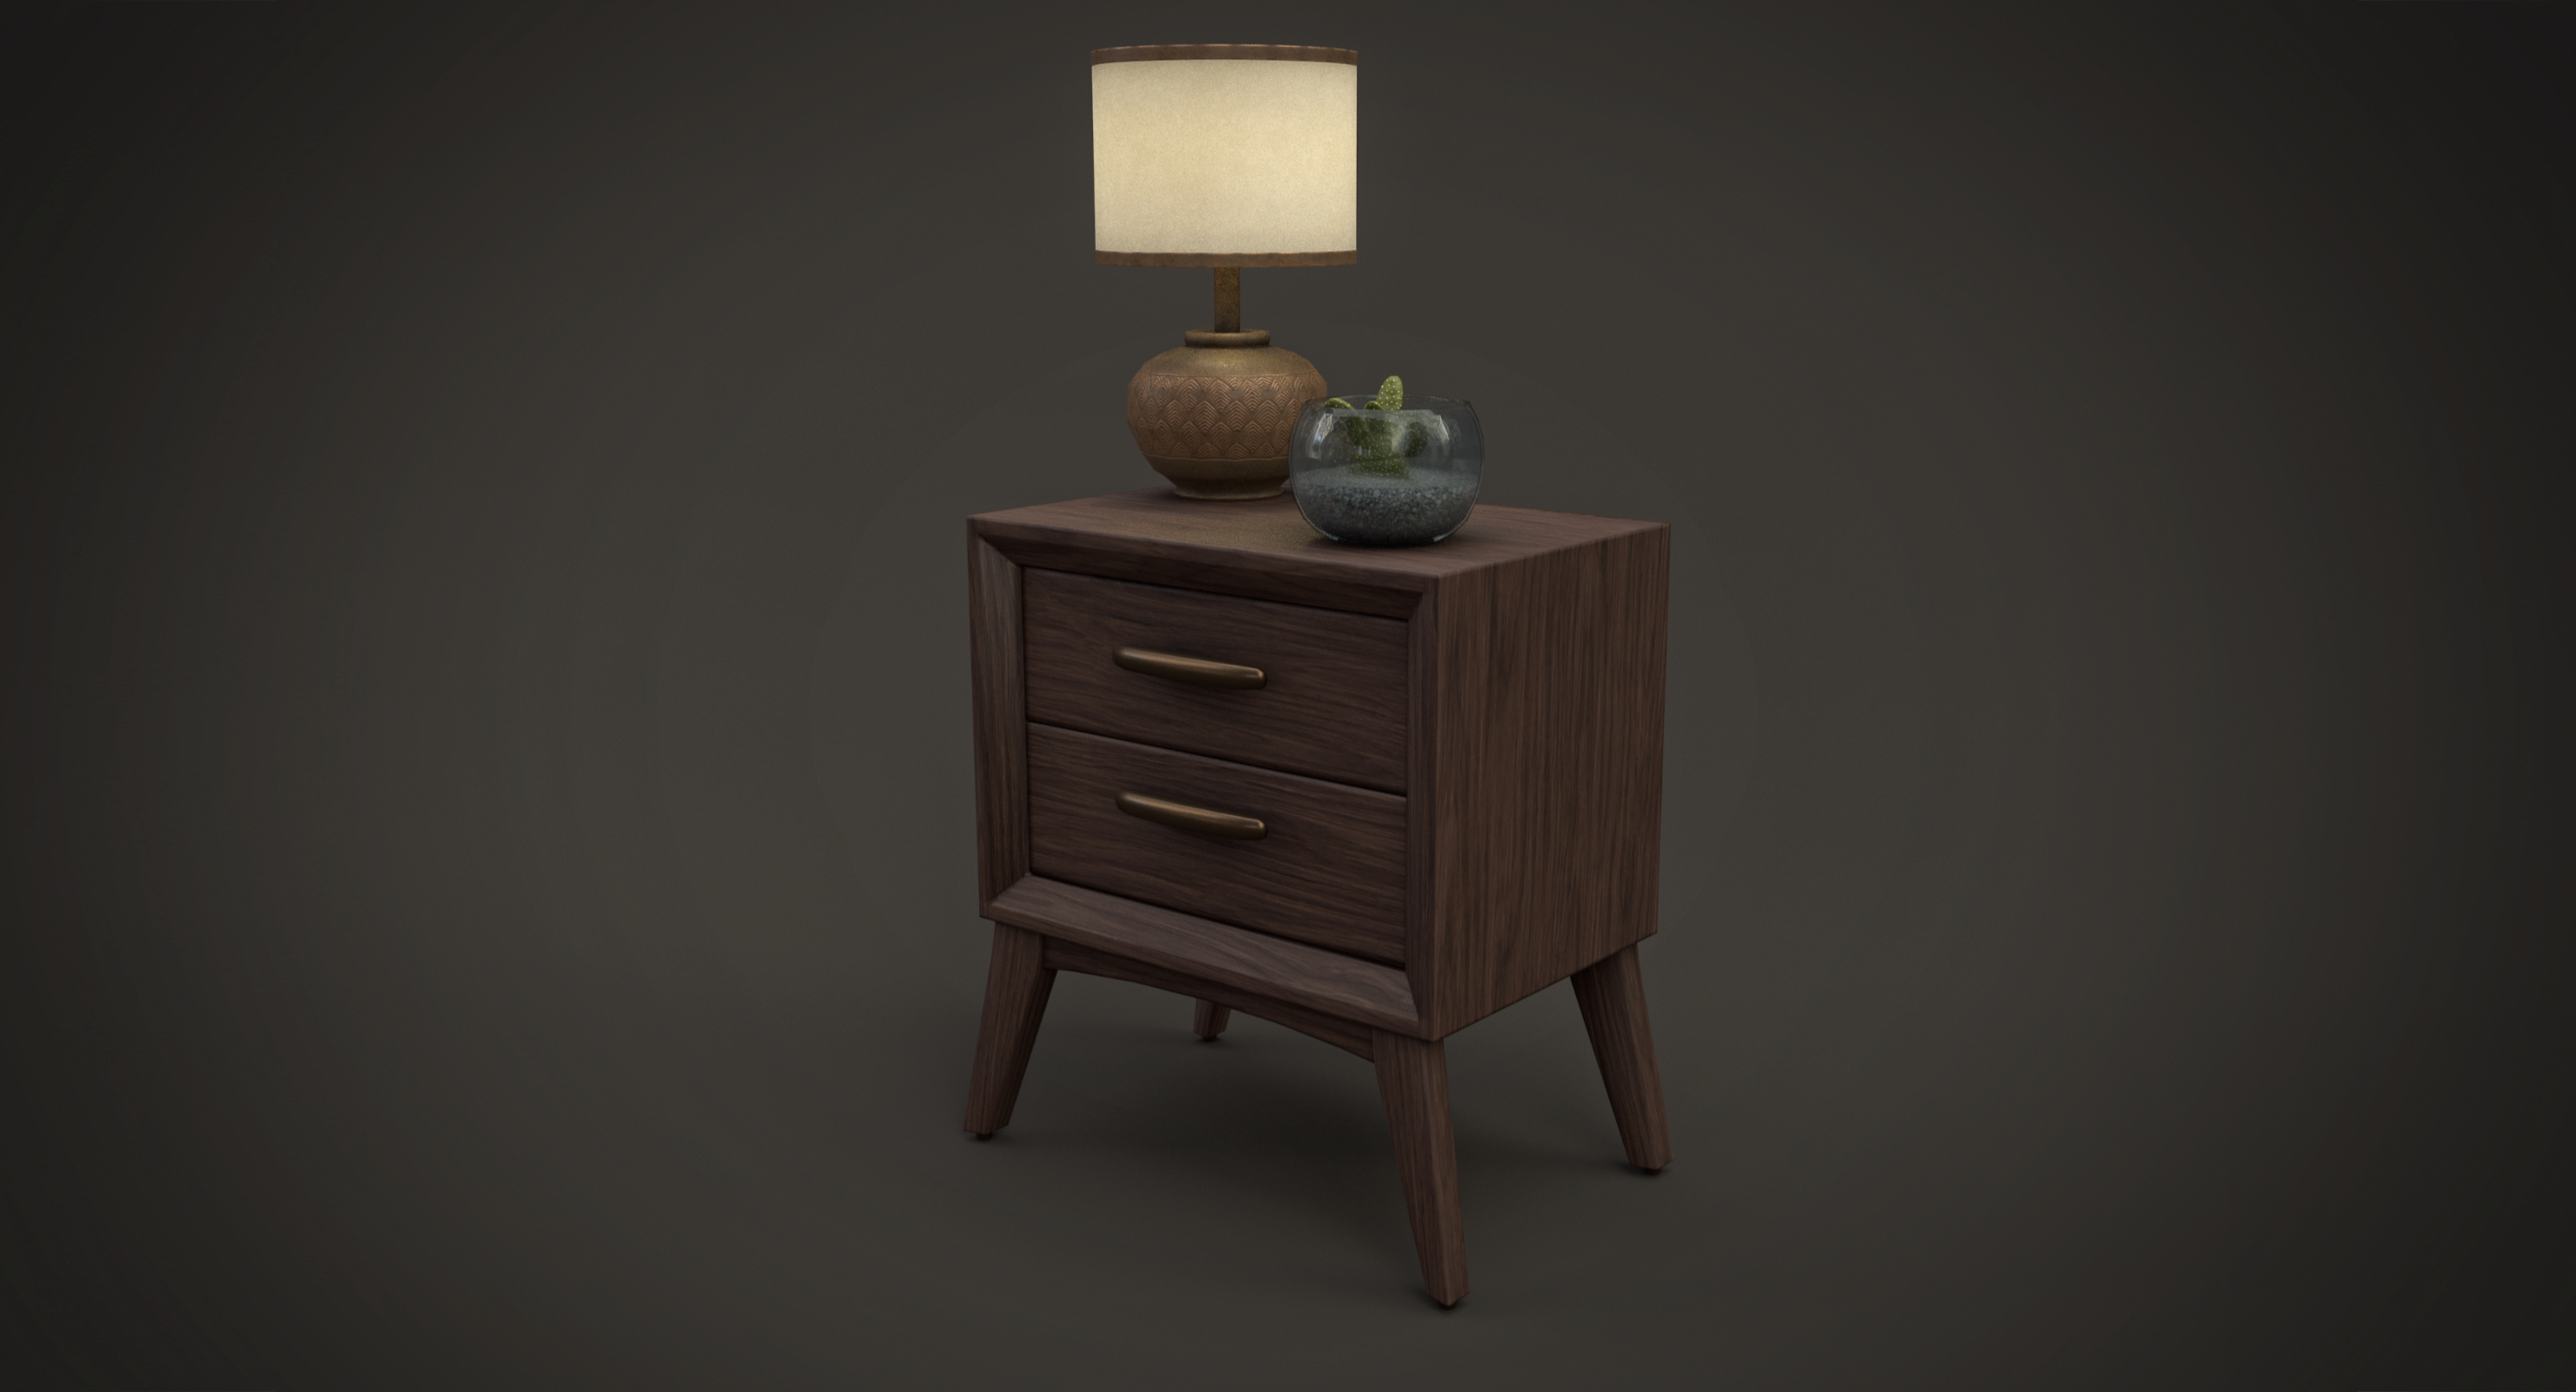 Rustic Nightstand Furniture Wood Model Turbosquid 1327302